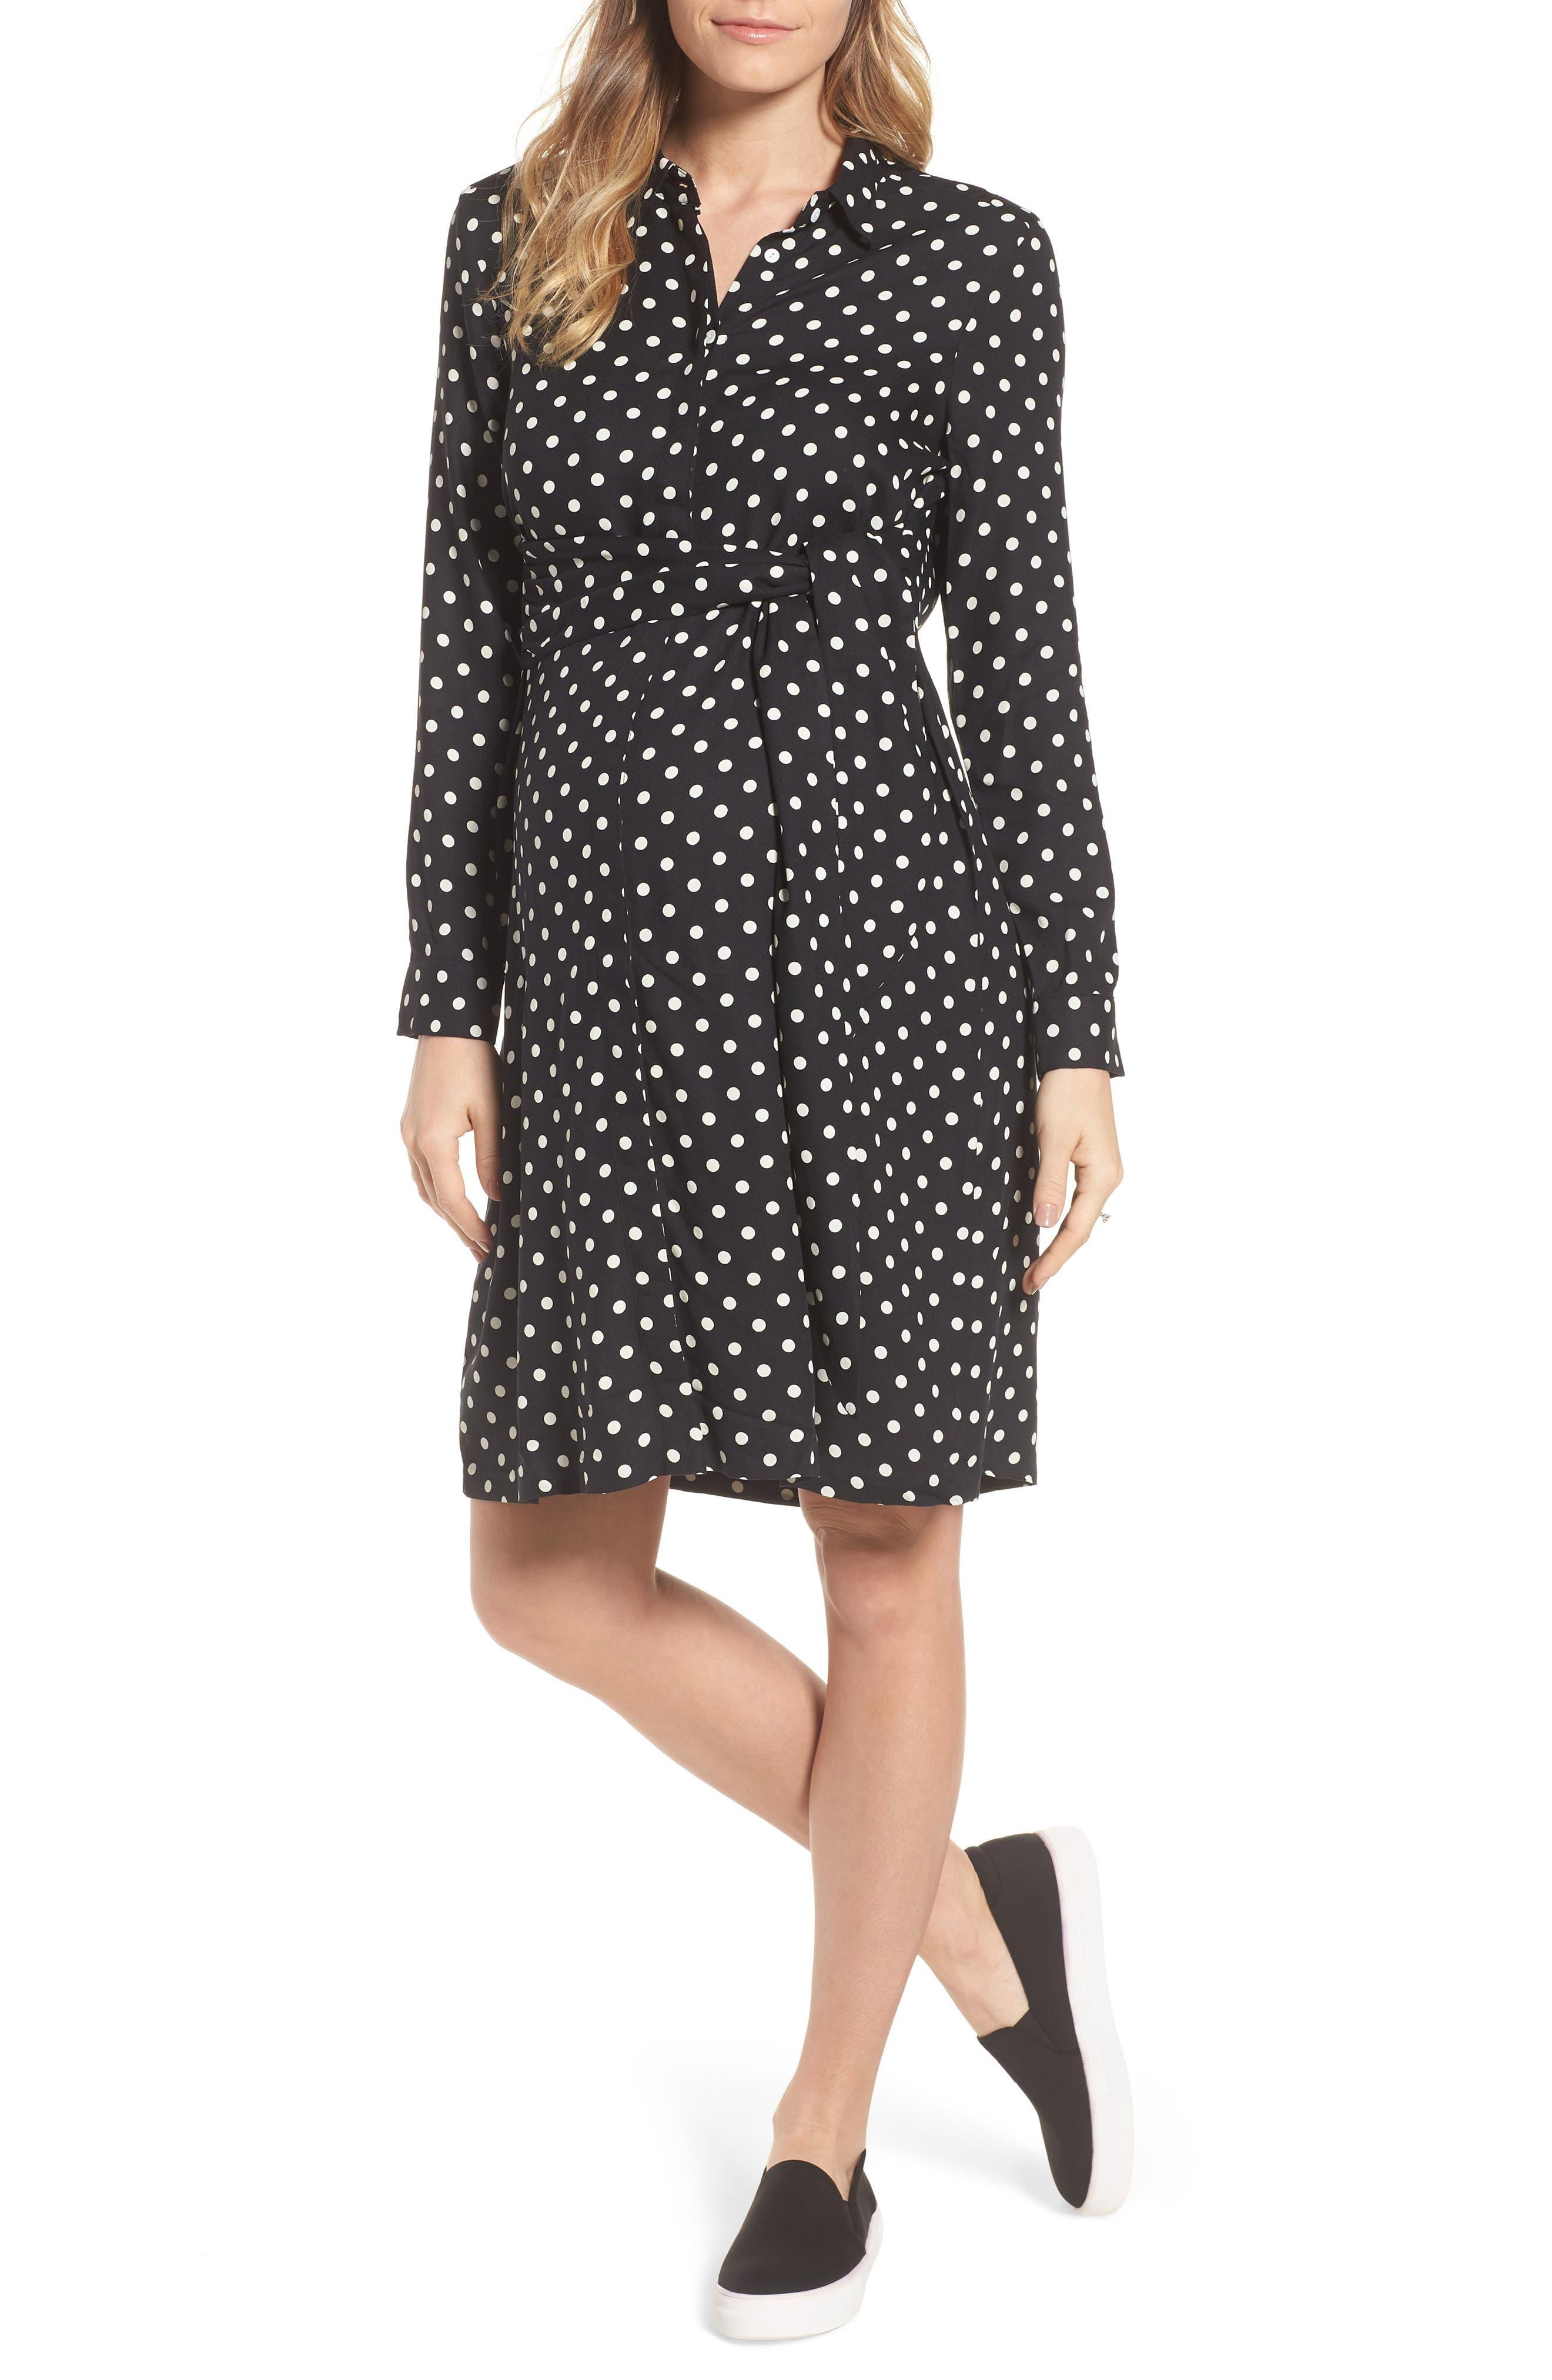 Elisha Maternity Shirtdress,                         Main,                         color, Black/White Polka Crepe